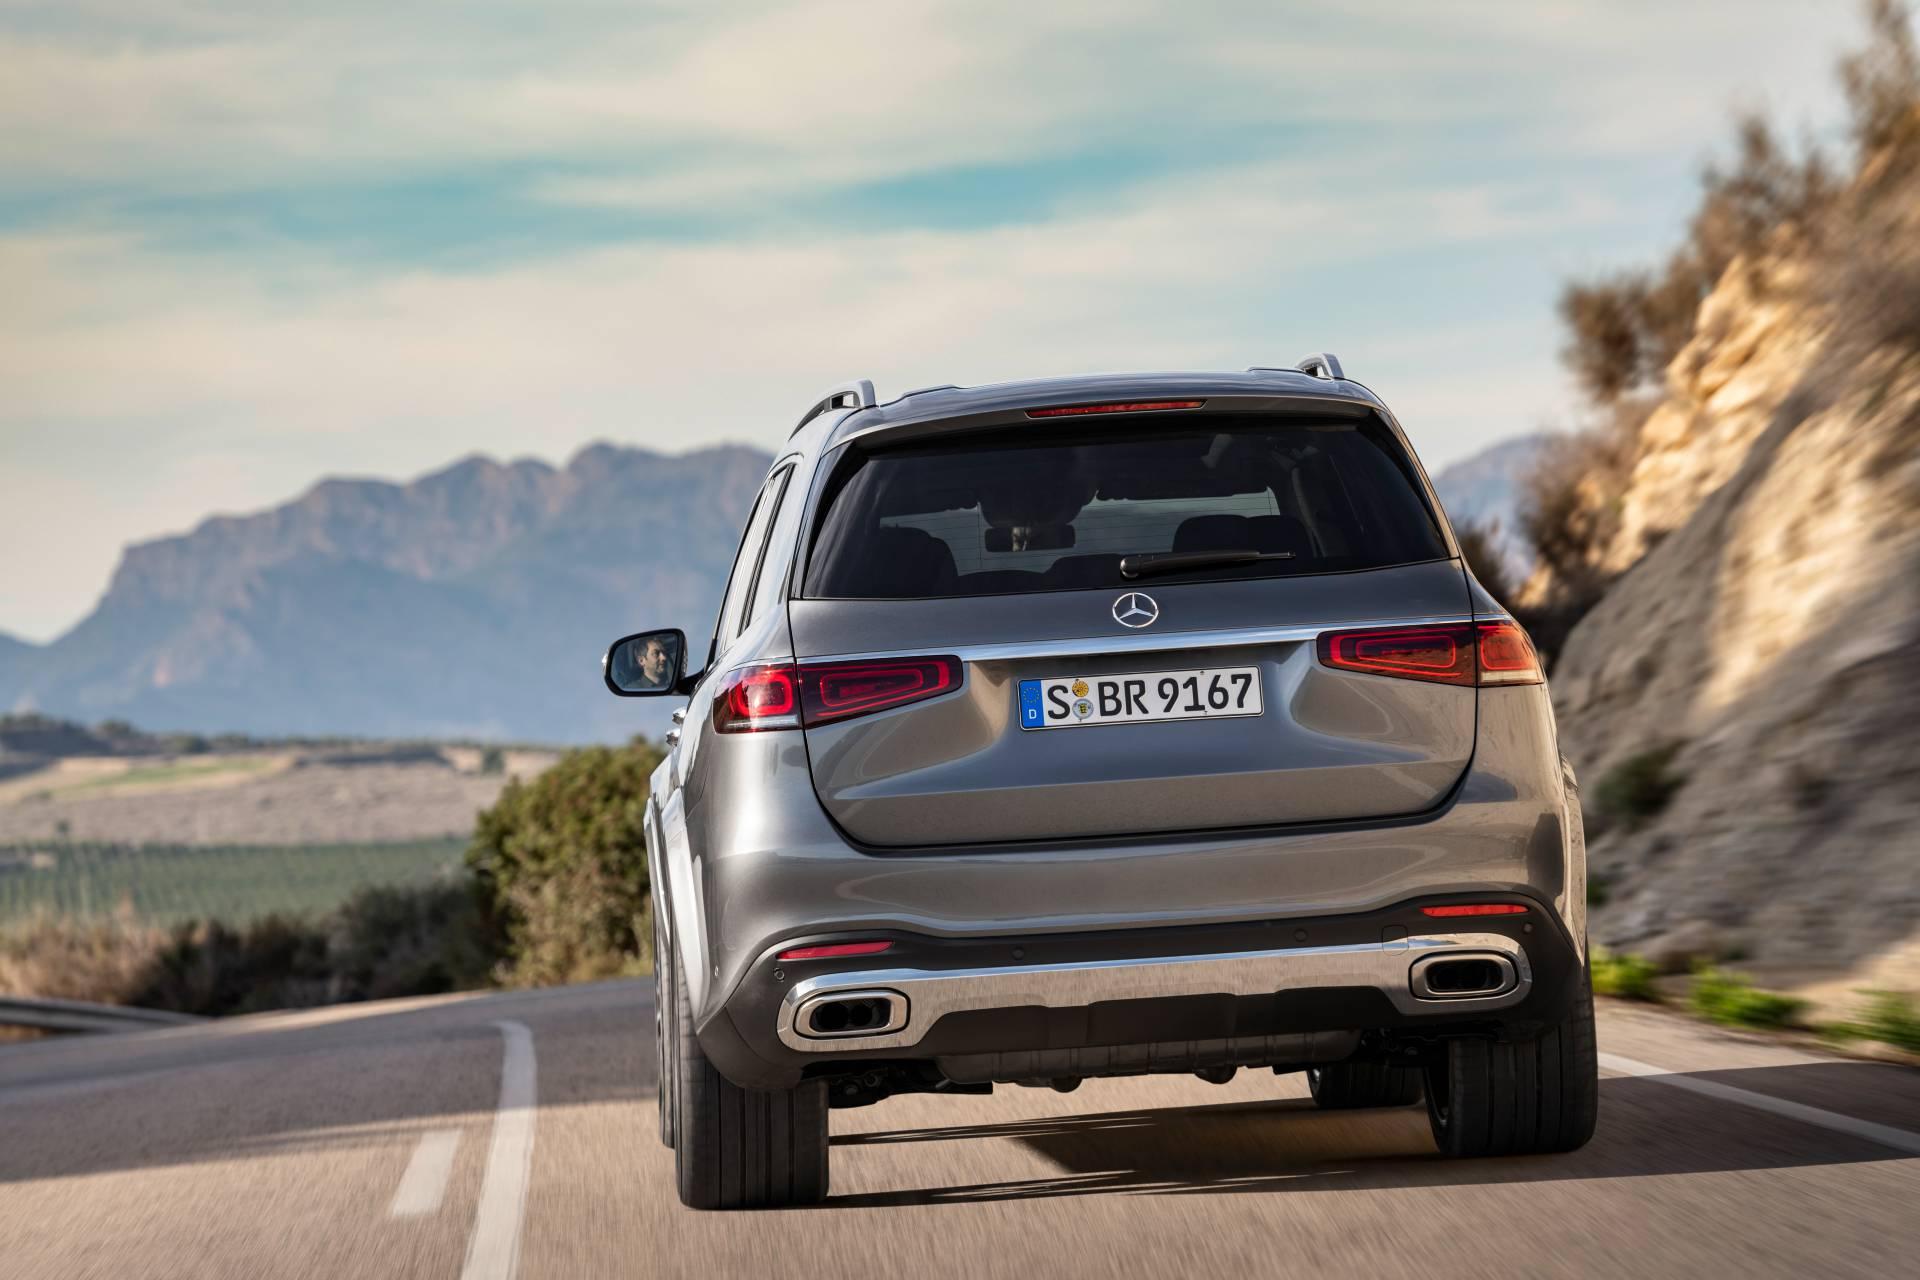 2020 Mercedes-Benz GLS rear-view